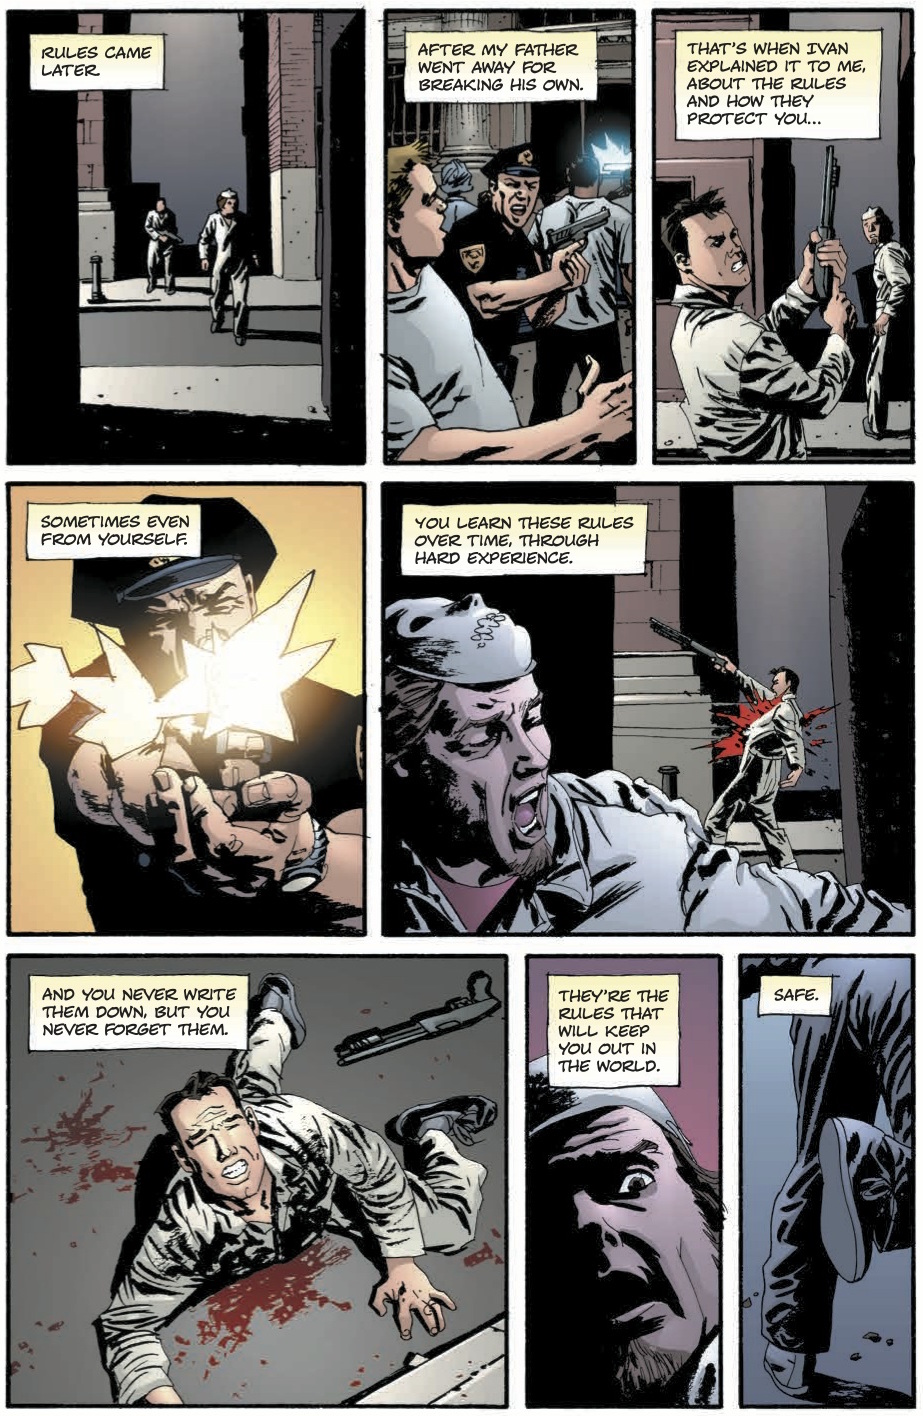 Criminal vol. 1: Coward, anteprima 01